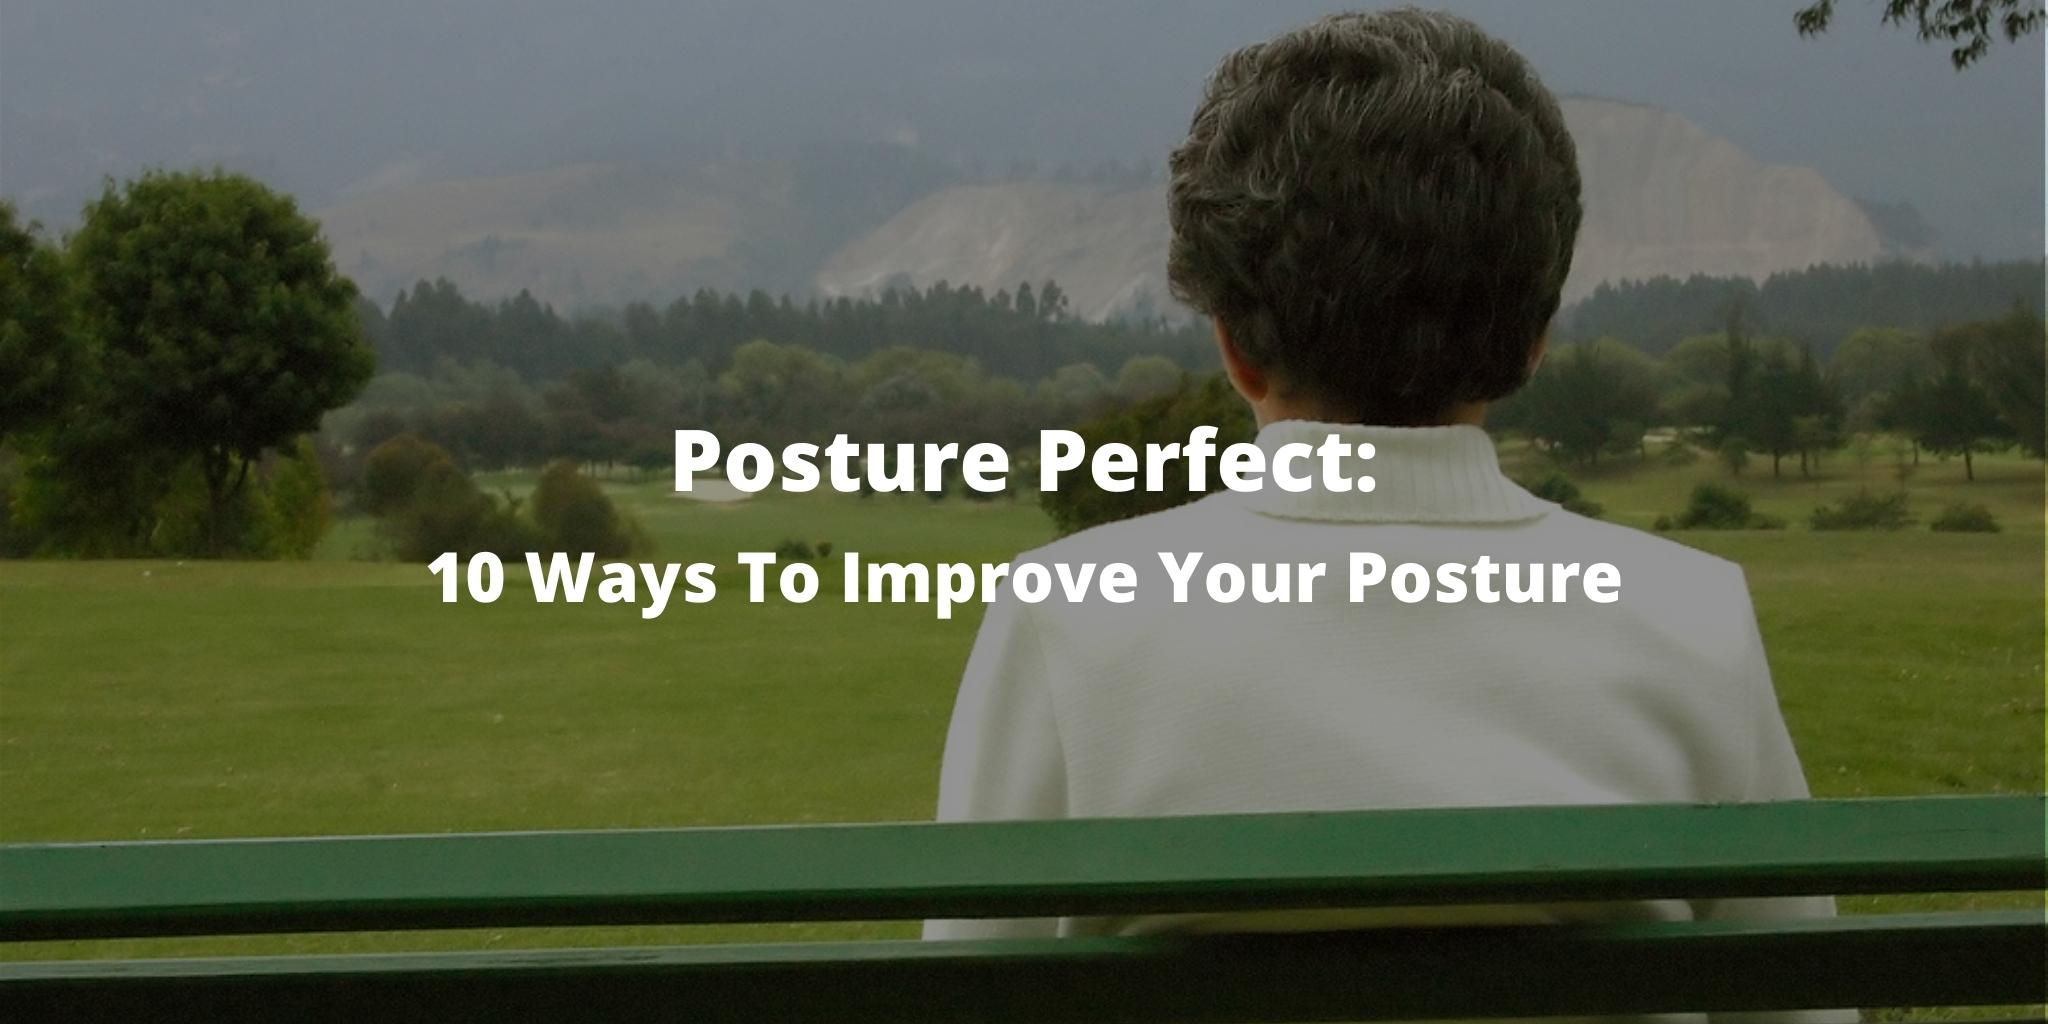 Posture Perfect: 10 Ways To Improve Your Posture